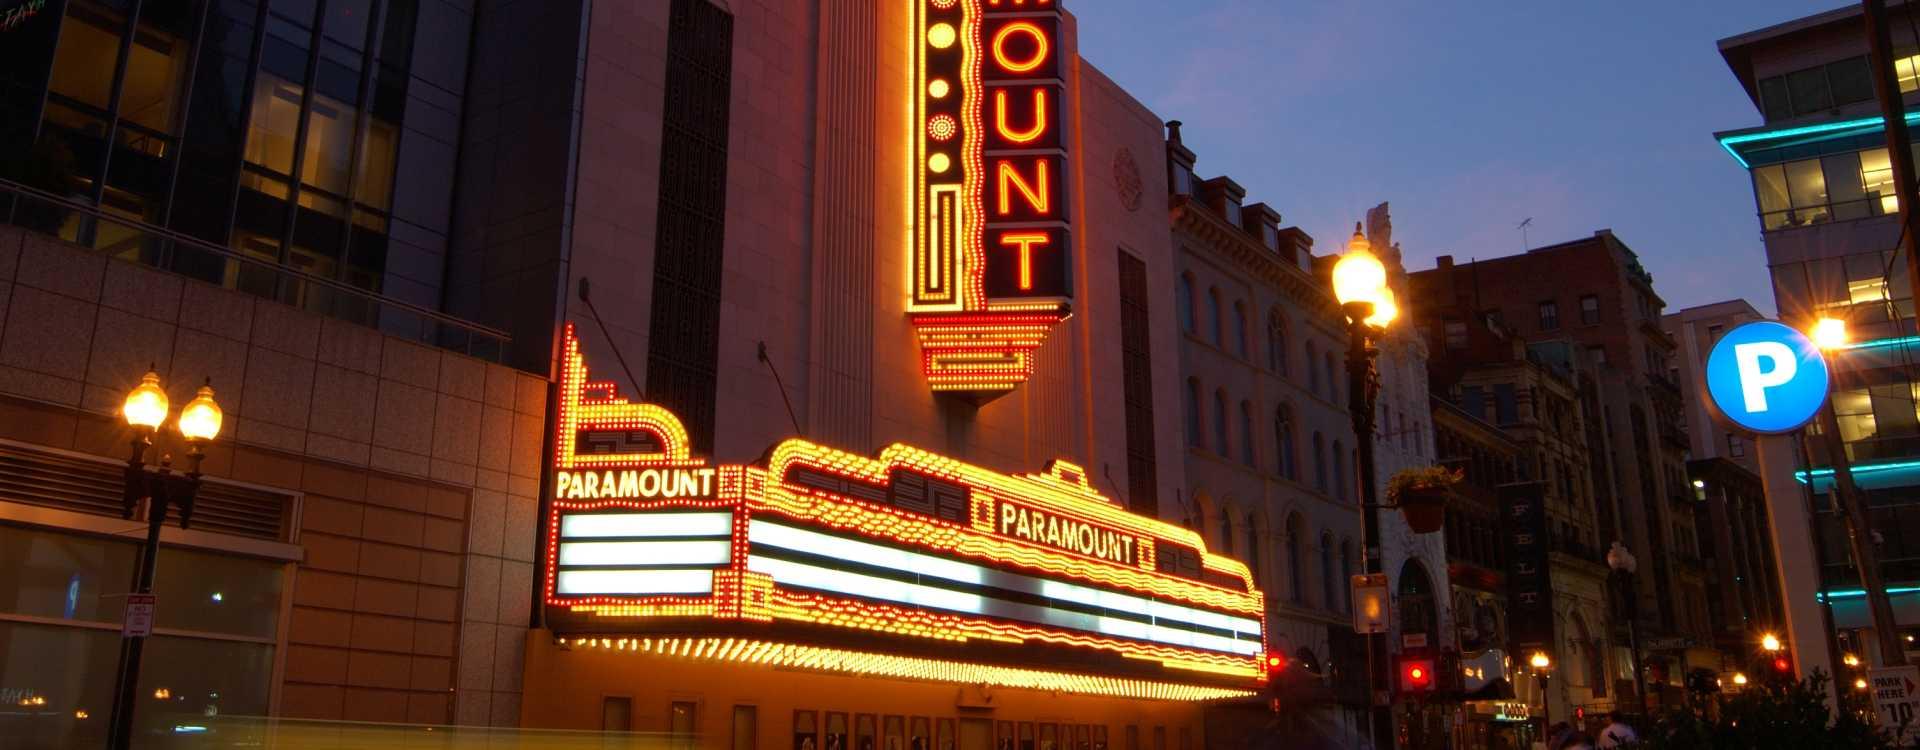 The Paramount Theatre